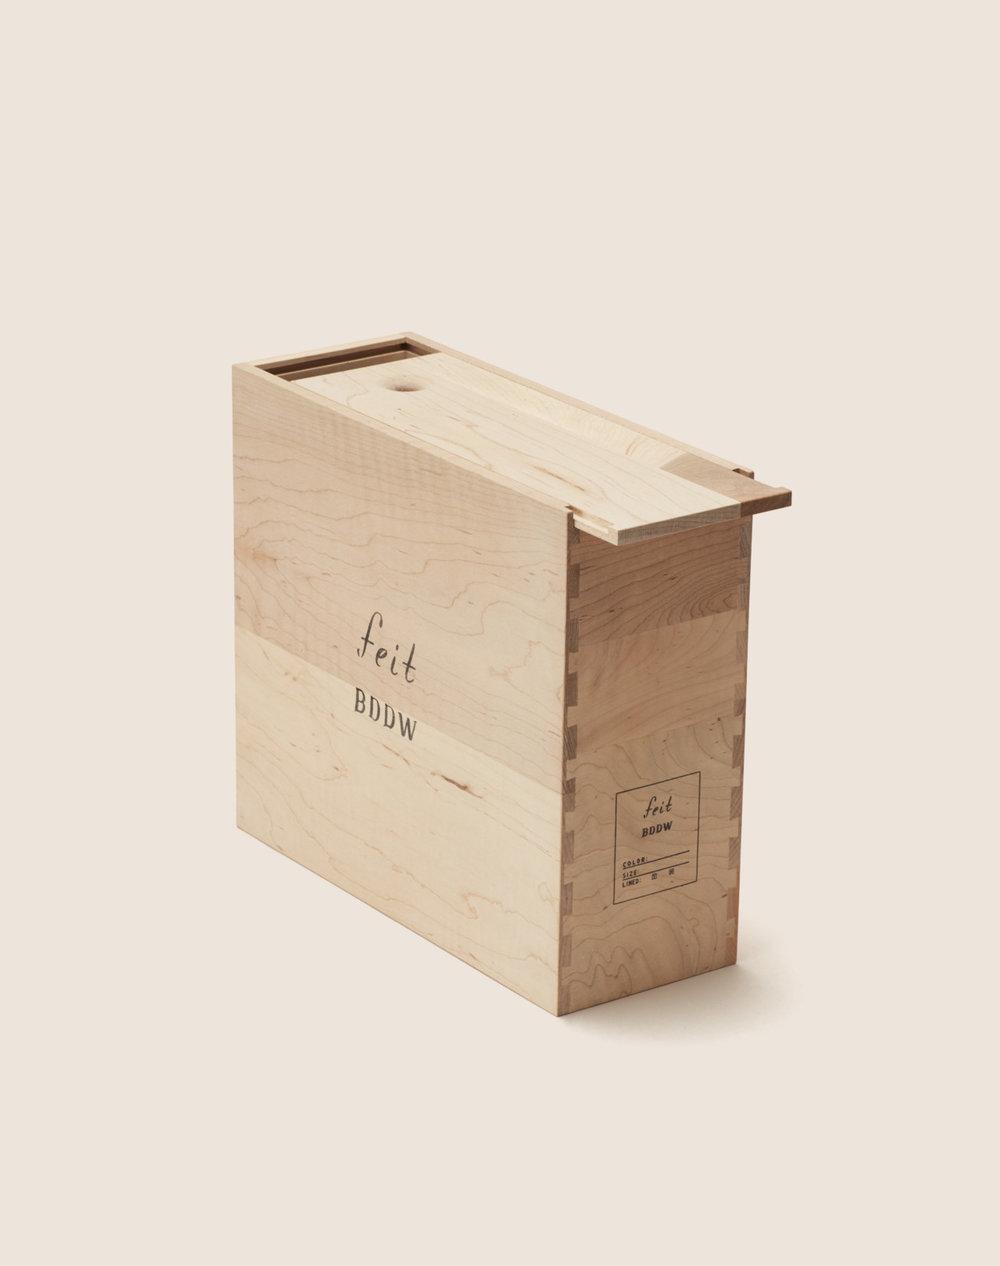 feit-bddw-box-1-1.jpg